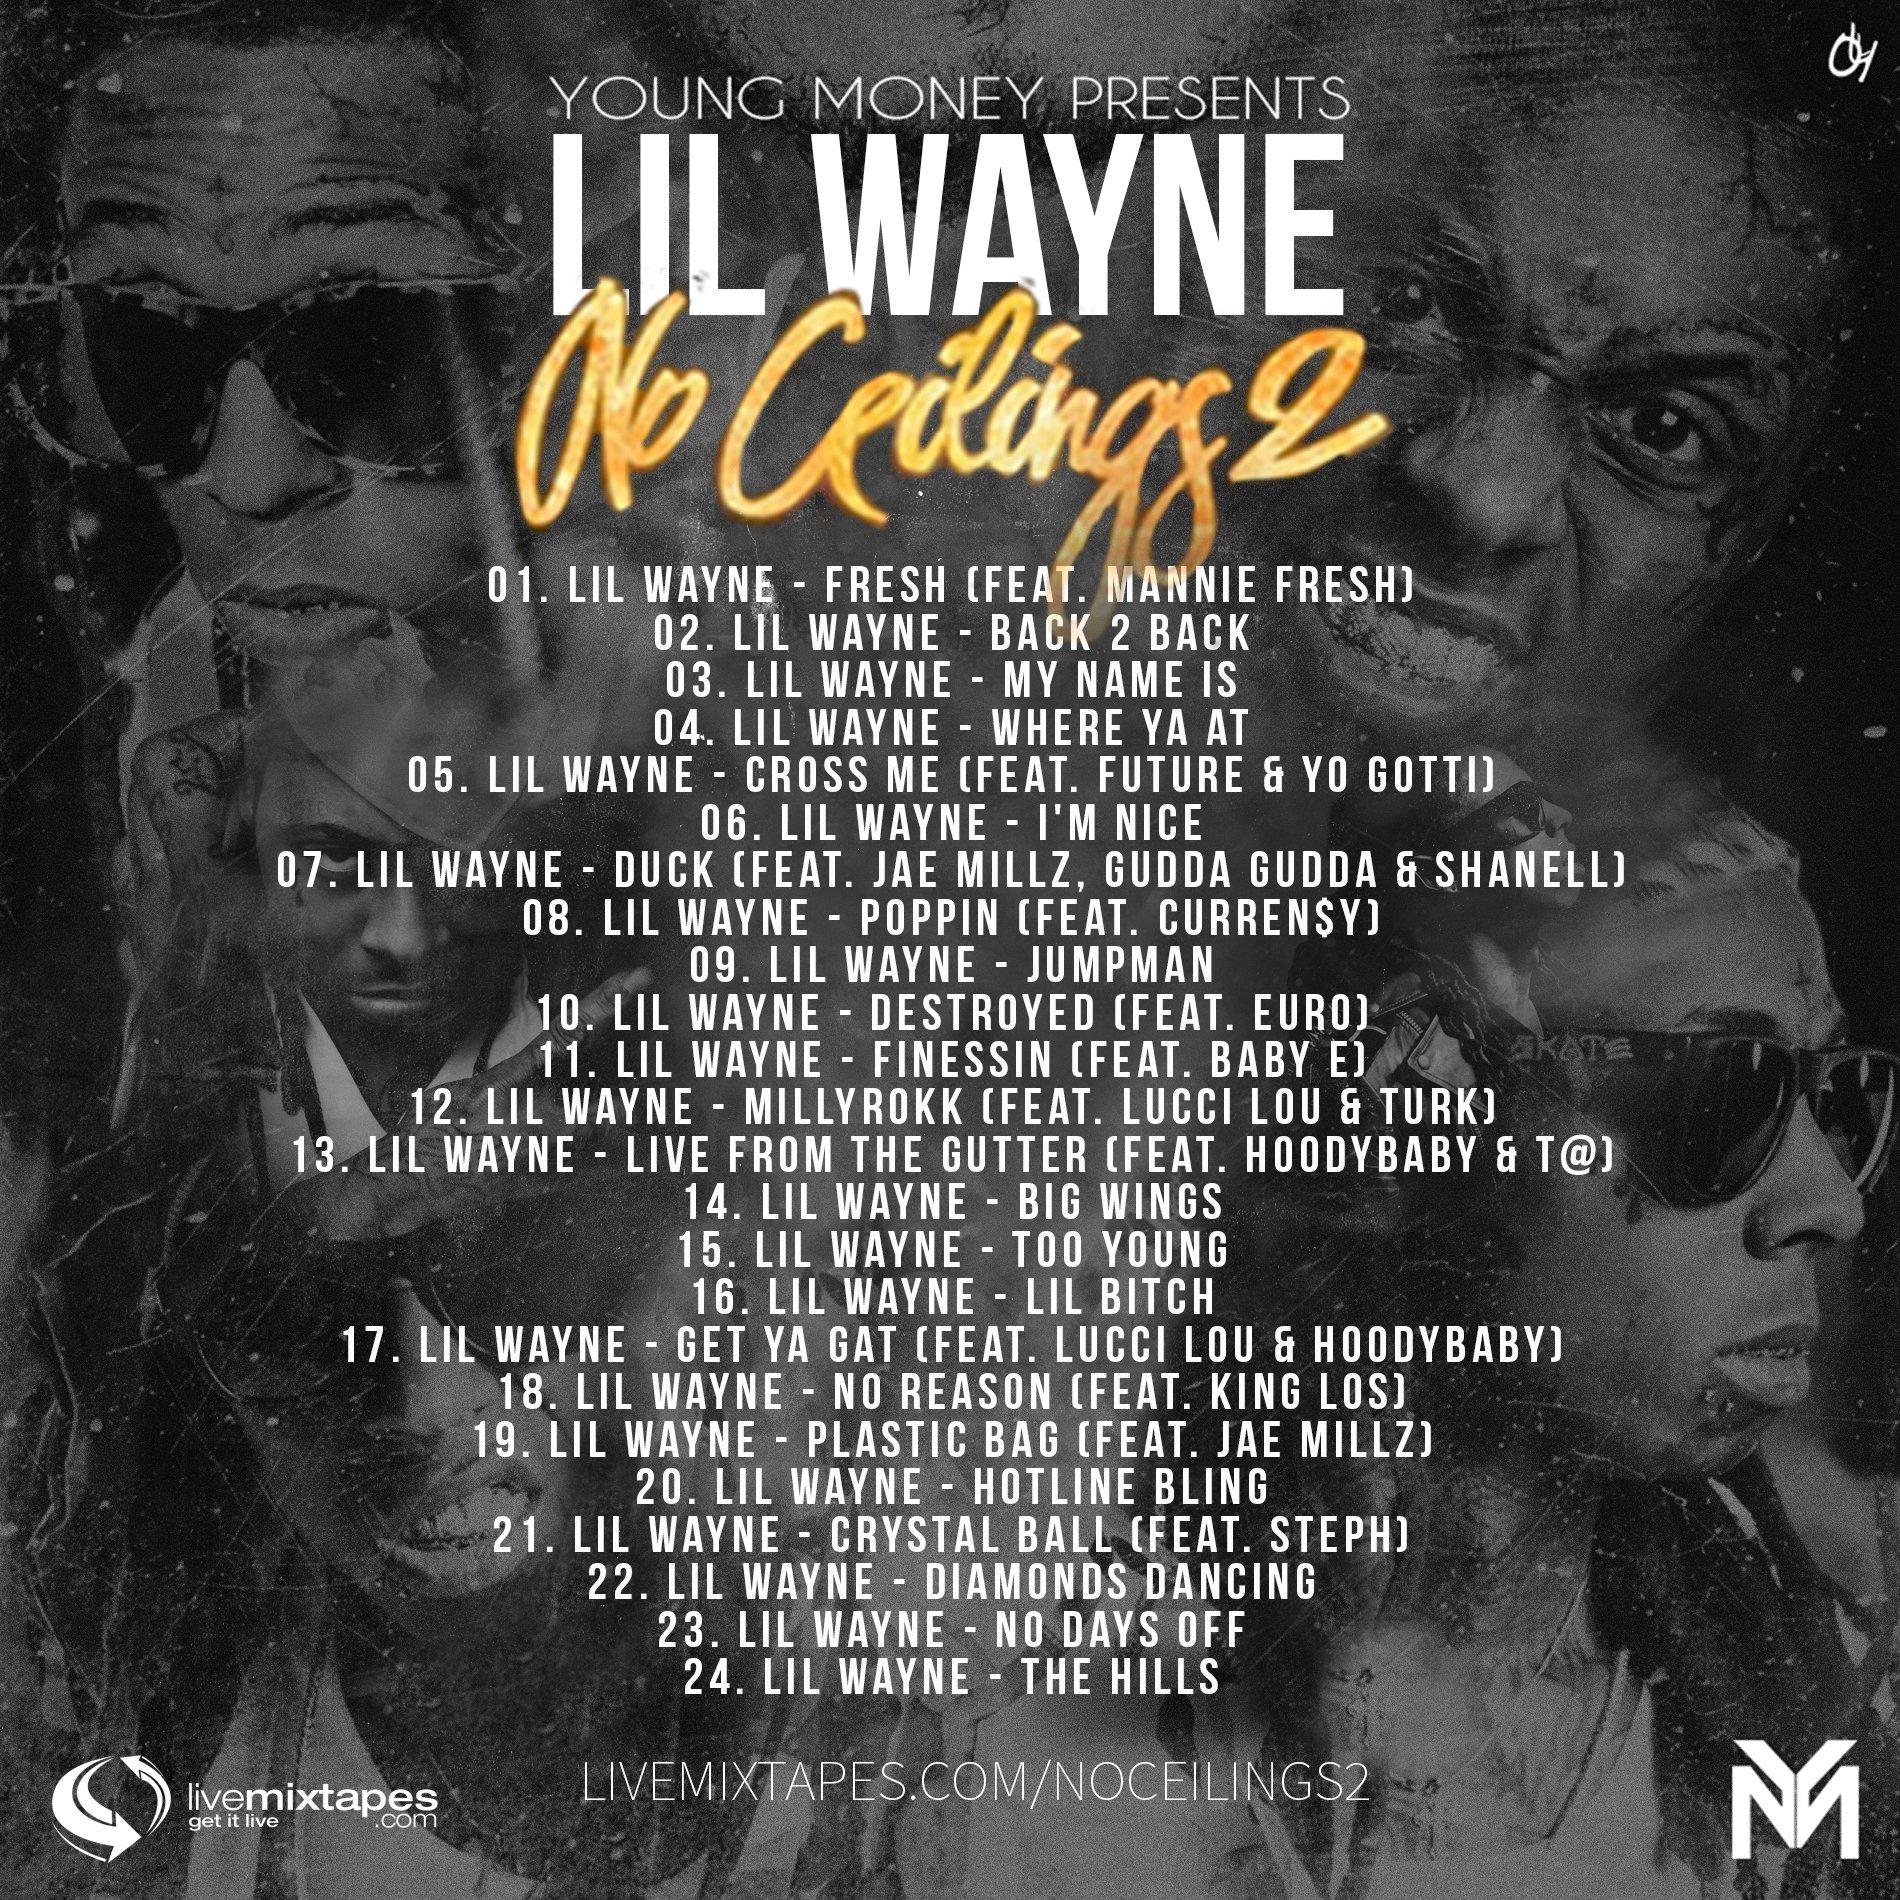 Lil wayne the carter 2 hustler musik